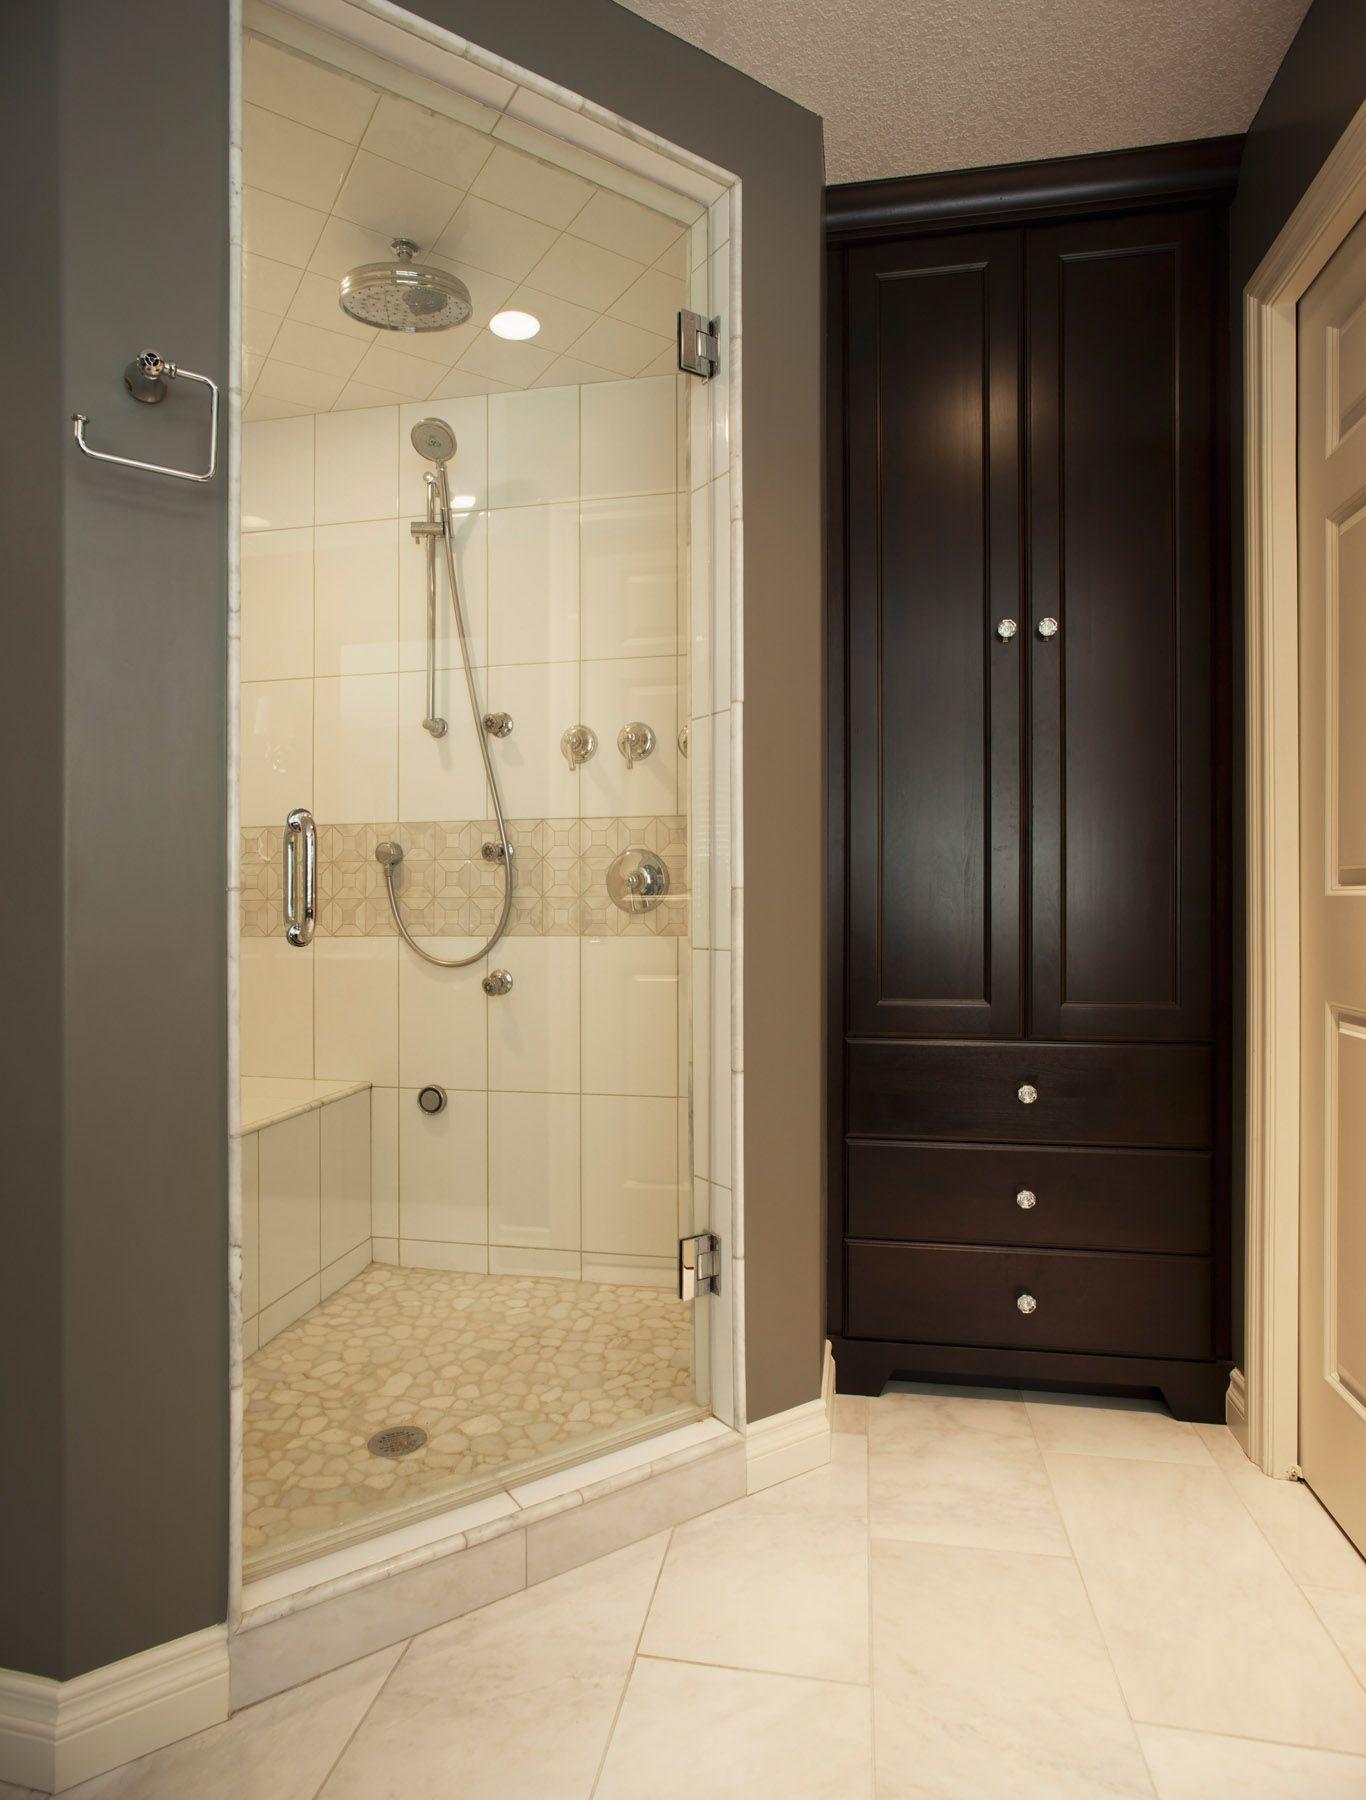 Bathroom Renovation Steam Shower With Multibody Jets And Rain - Bathroom remodel steam shower